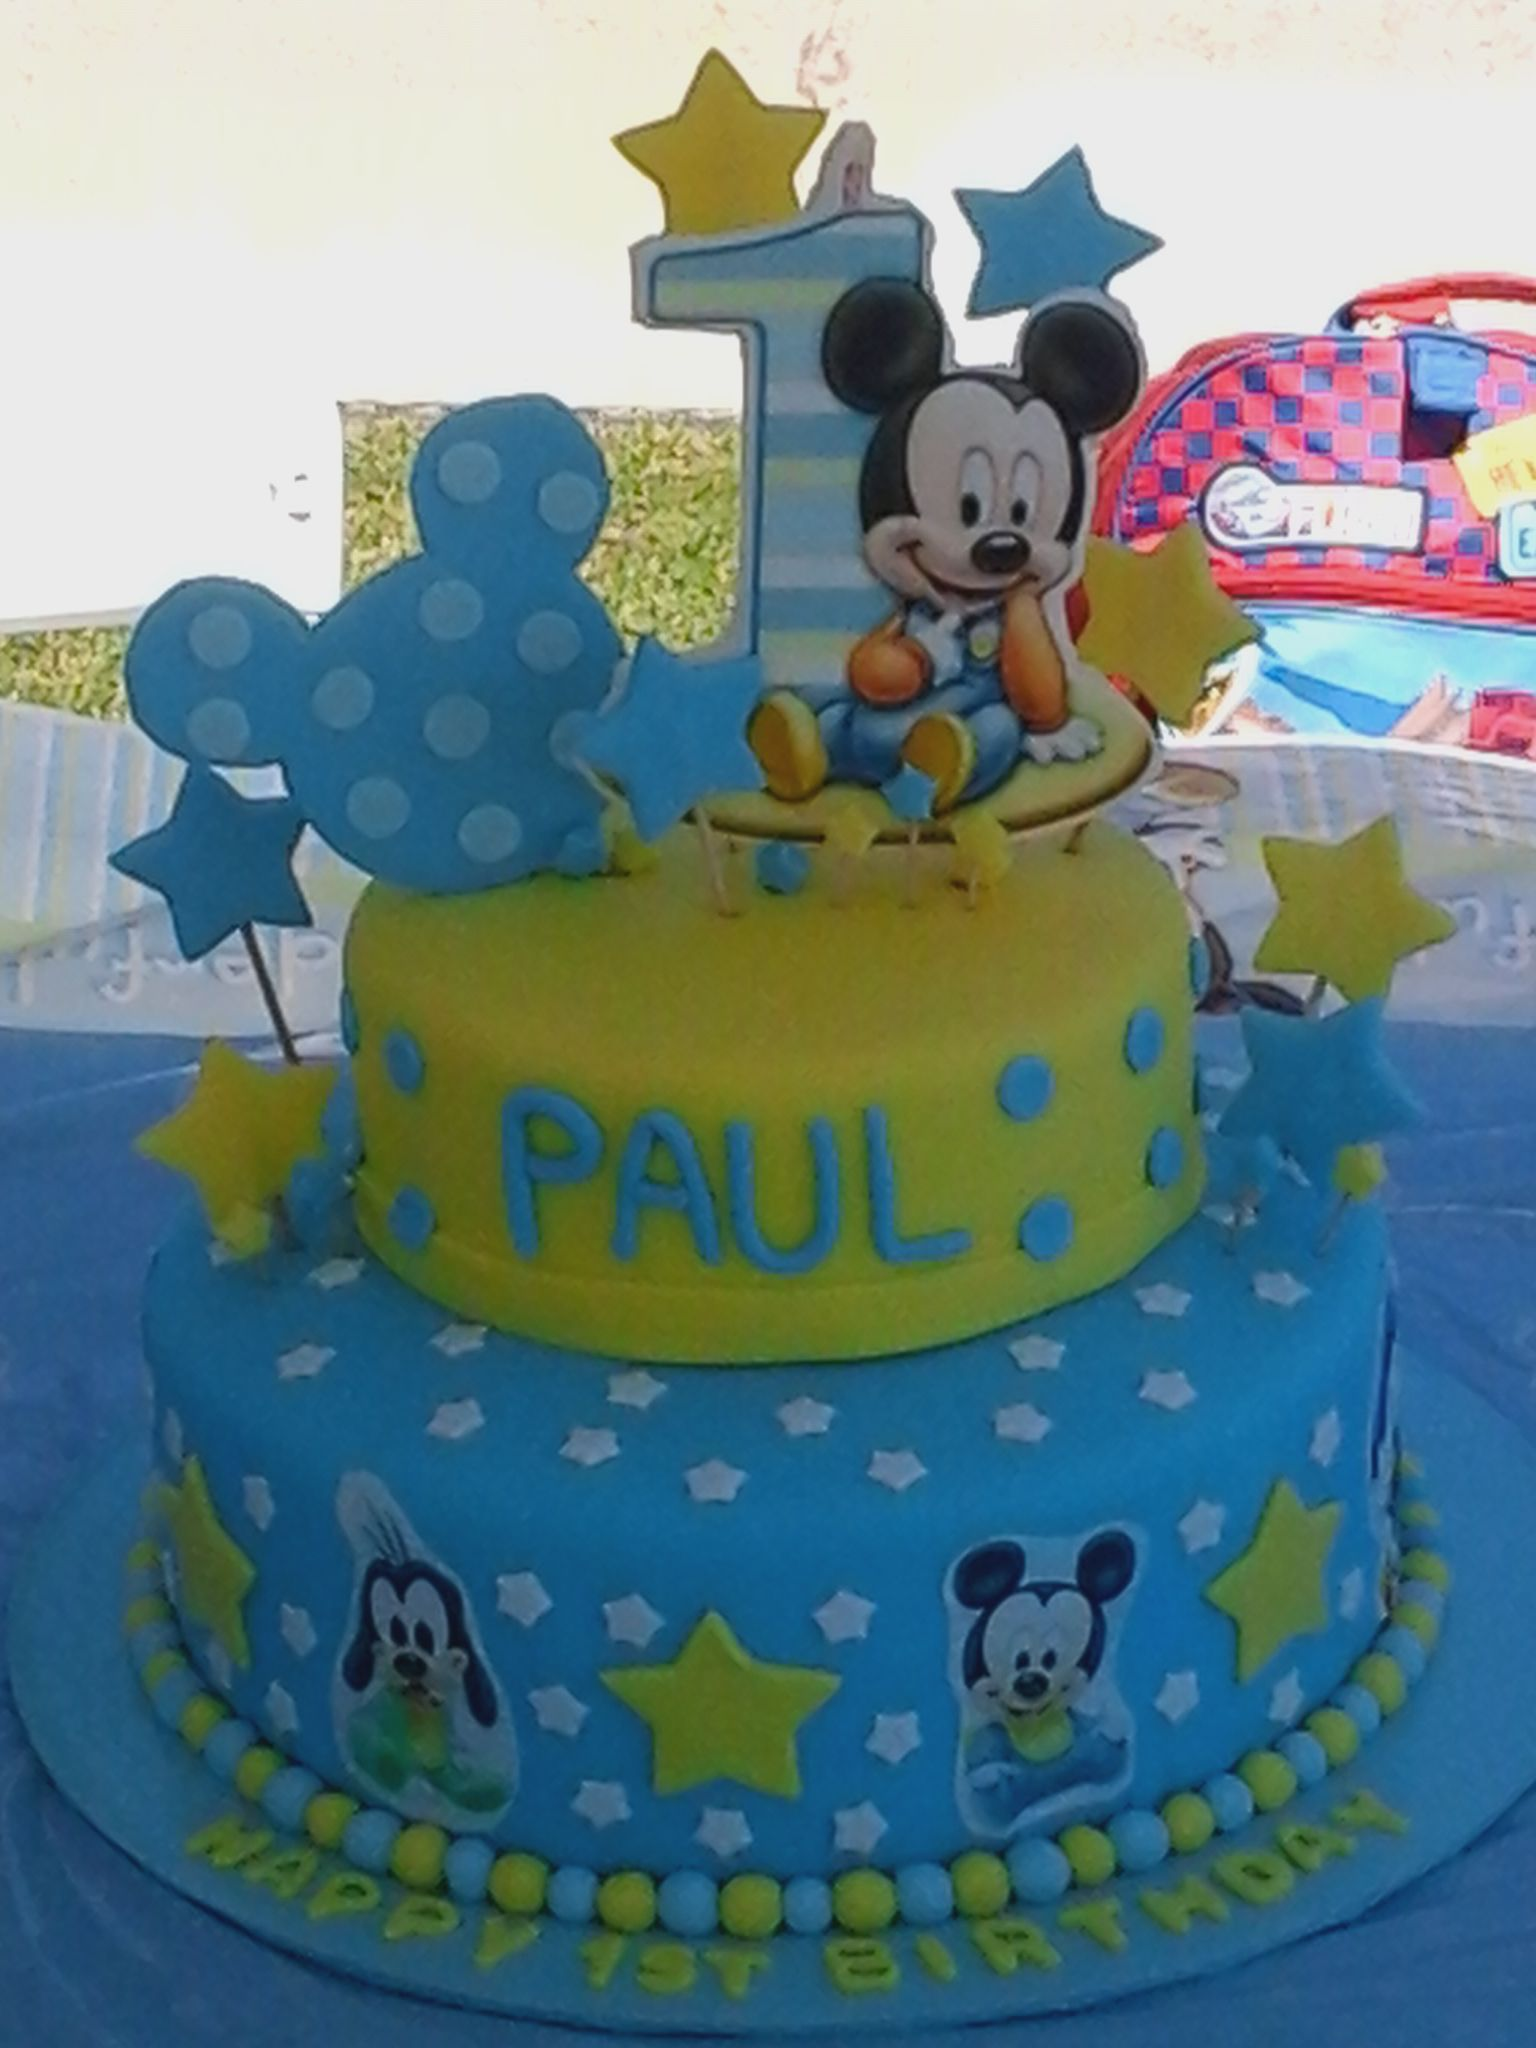 Astonishing Baby Mickey Mouse 1St Birthday Cake By Estellas Cakery Mickey Personalised Birthday Cards Sponlily Jamesorg